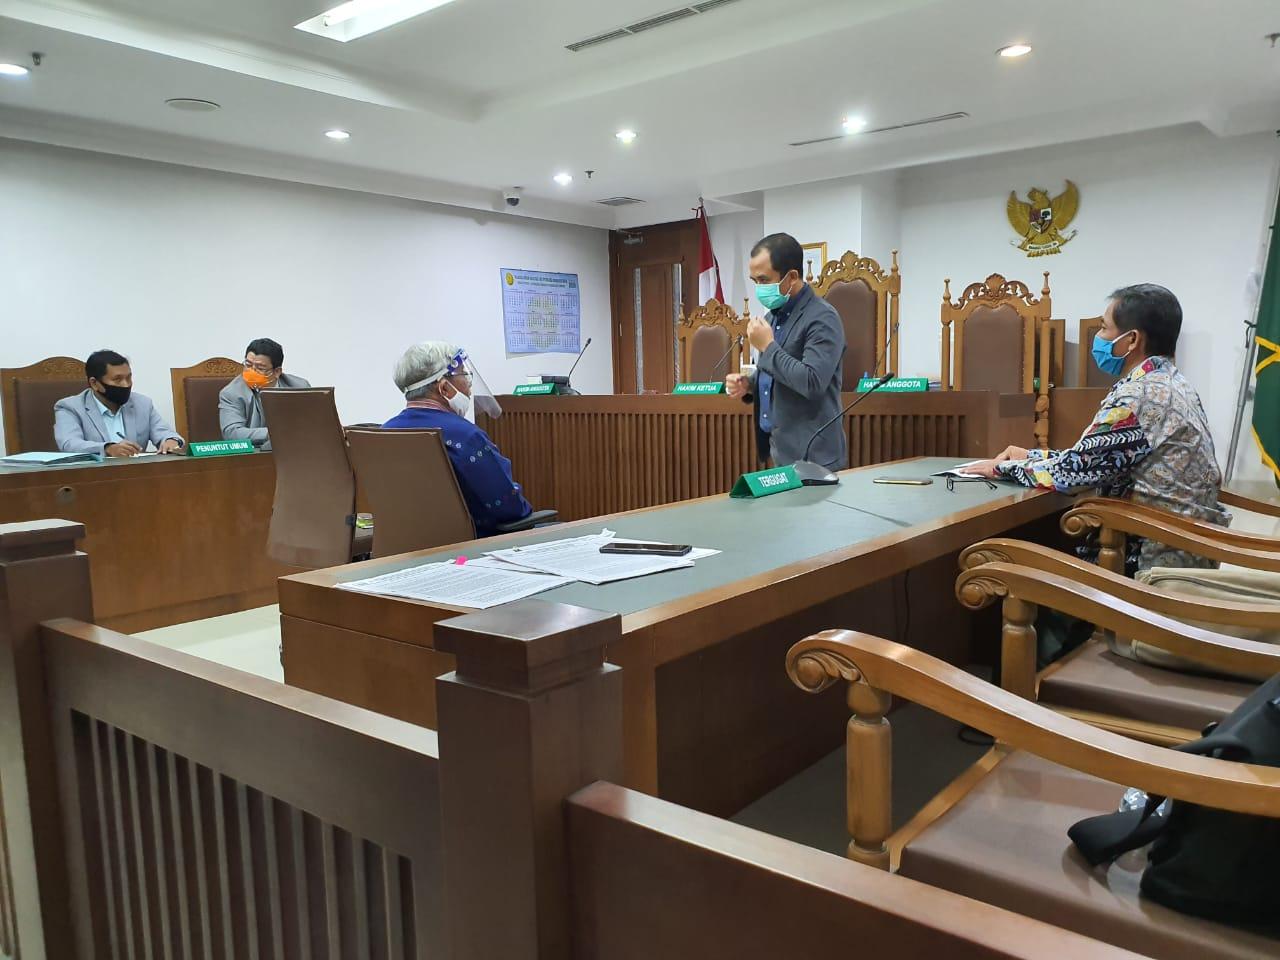 Kasus Pencemaran Limbah B3: Praperadilan Direktur PT. NTS Kepada KLHK Ditolak